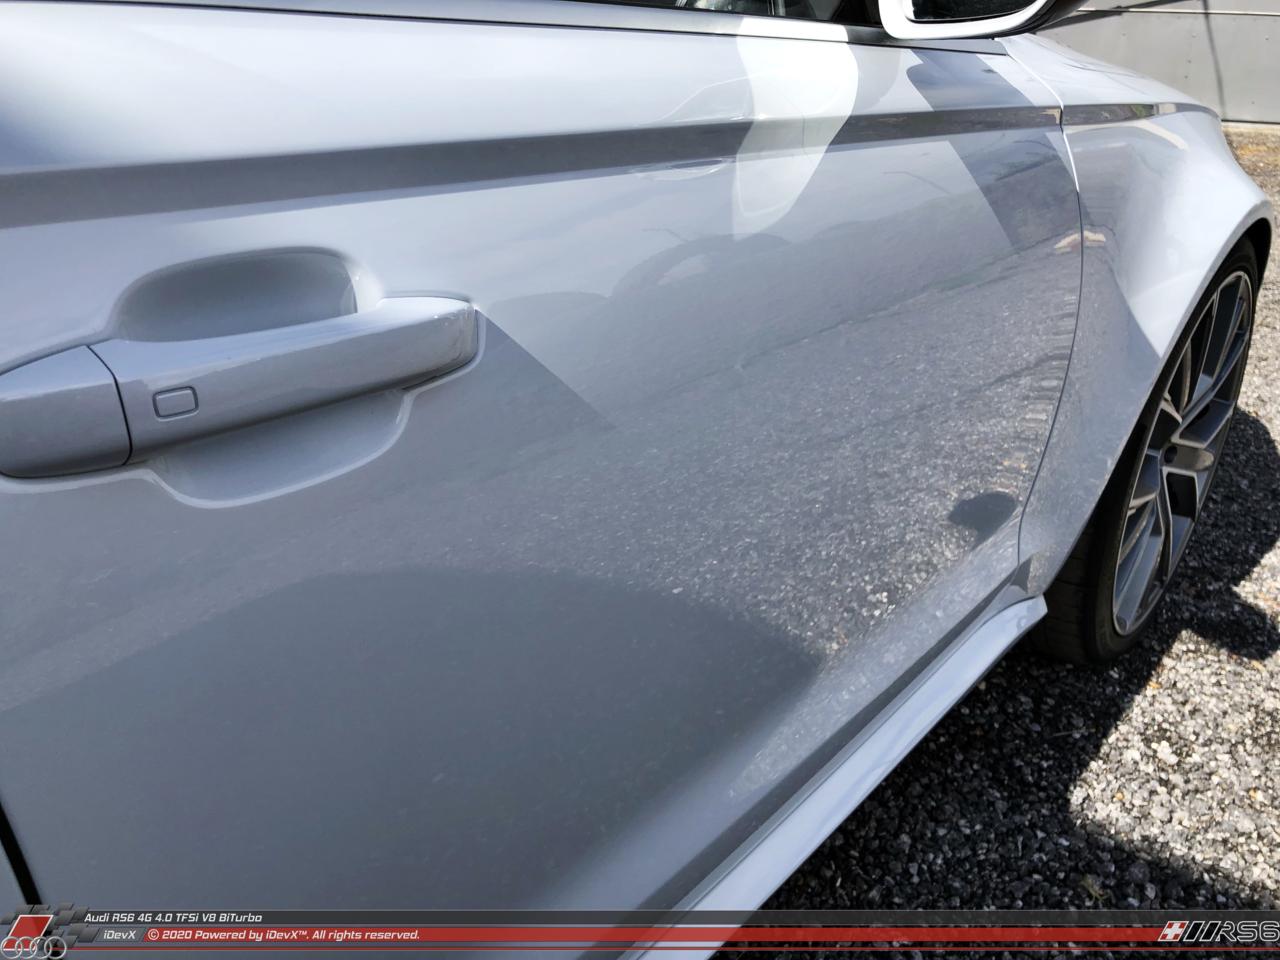 05_08.2019_Audi-RS6_iDevX_051.png